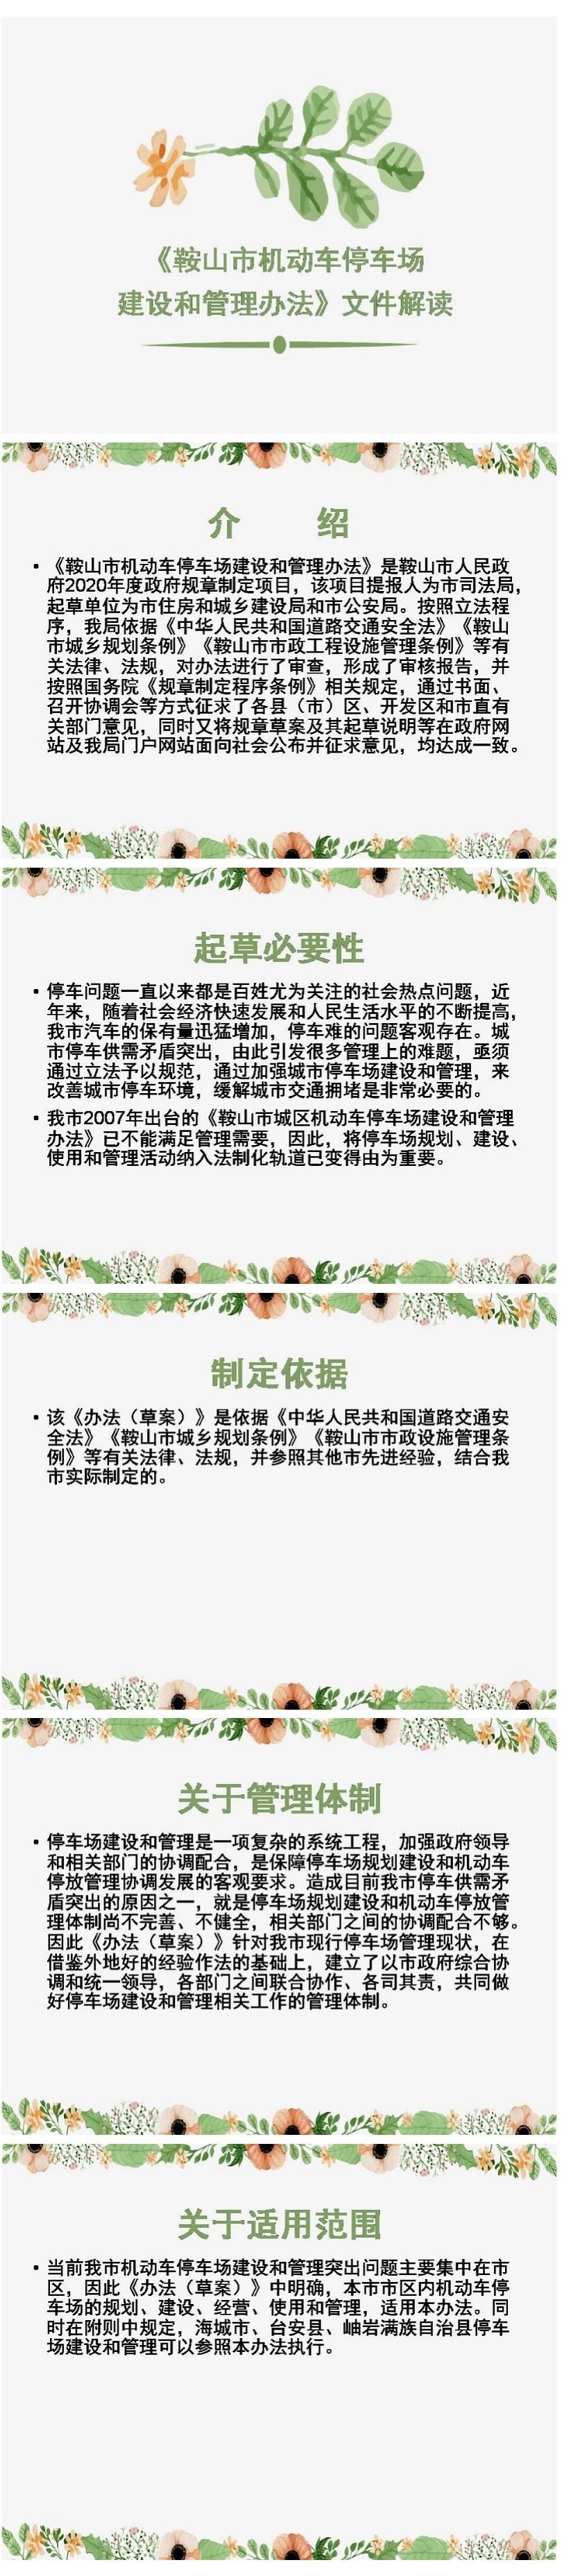 C:UsersAdministratorDesktop\u300a鞍山市机动车停车场建设和管理办法》文件解读.jpg